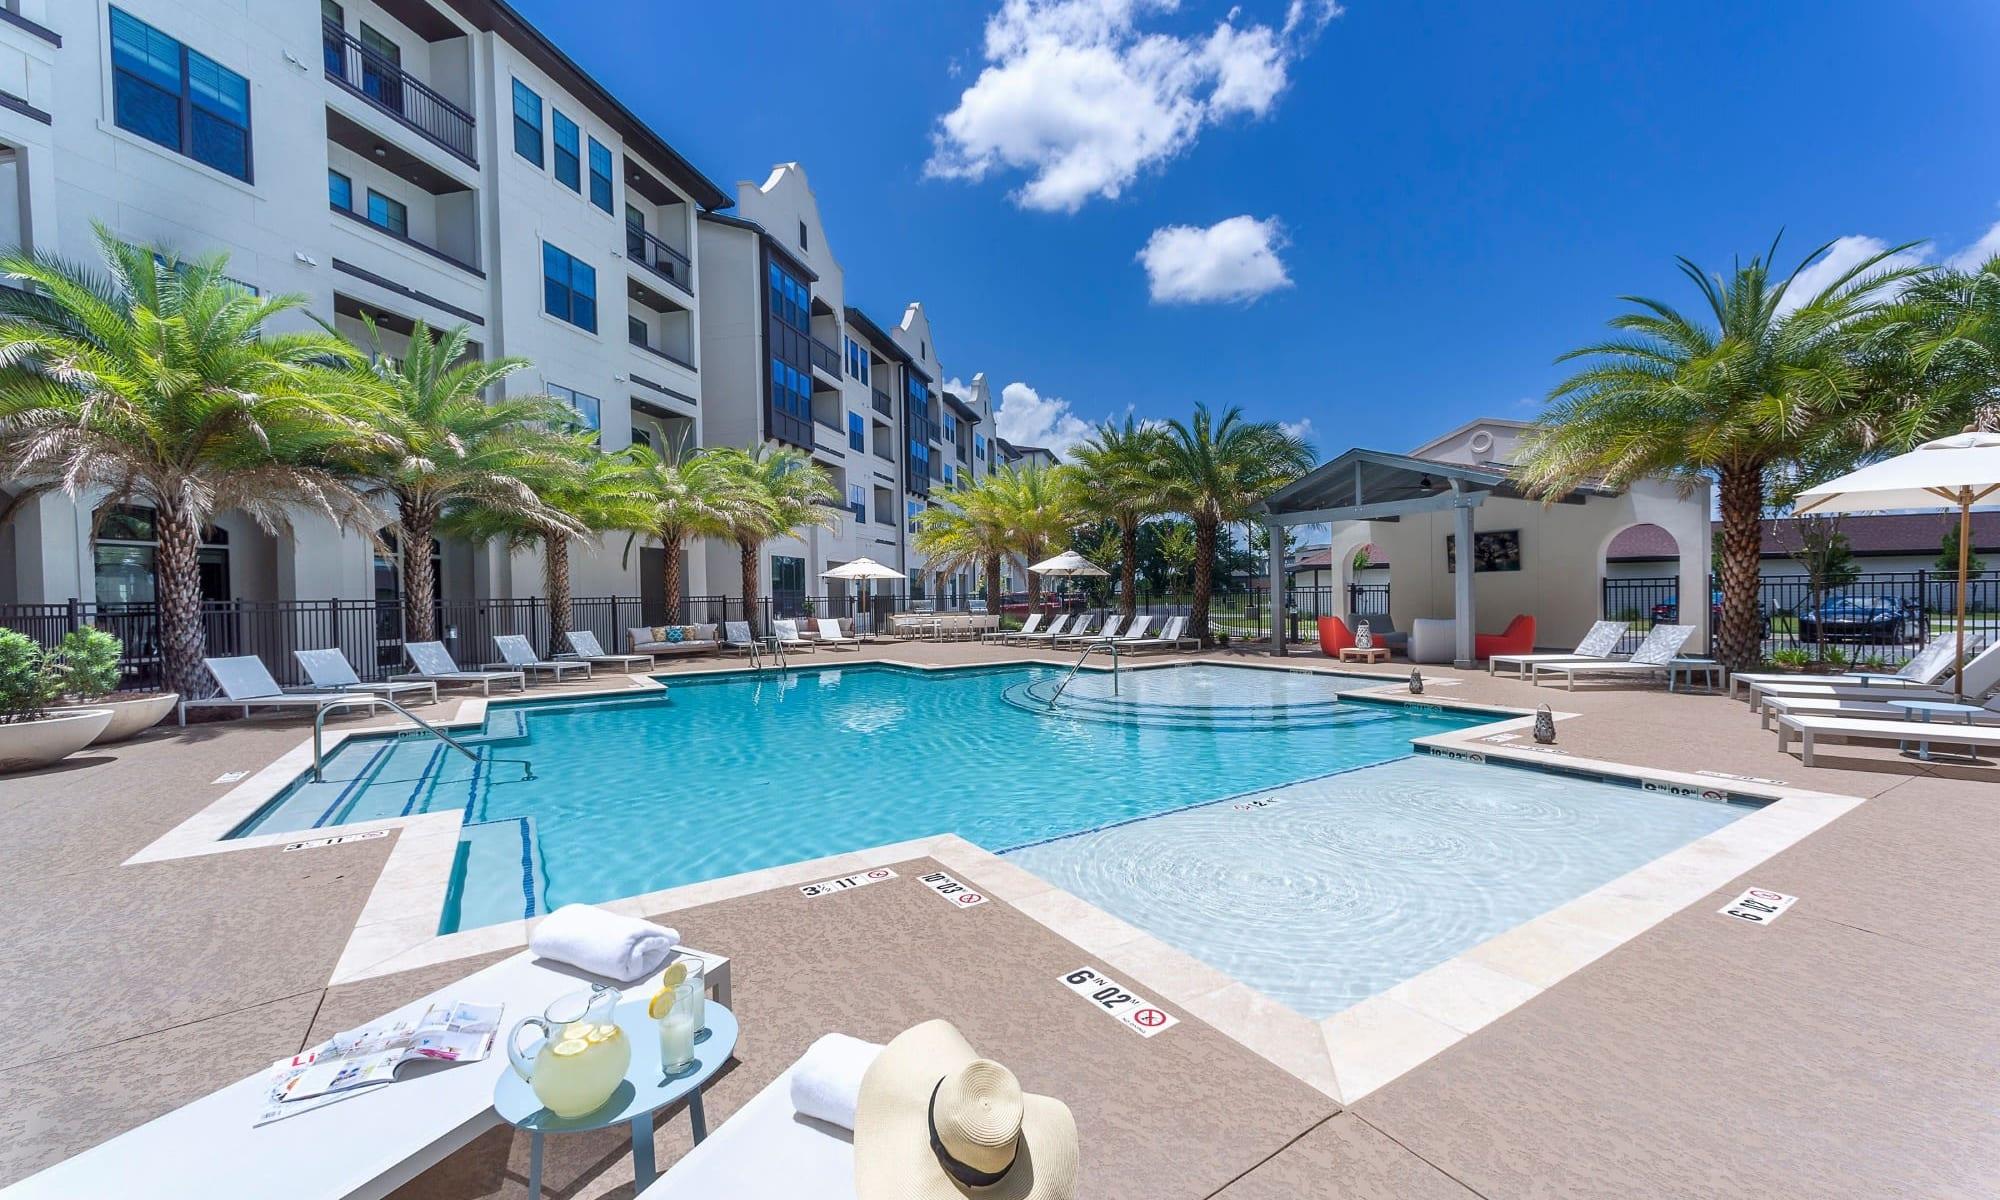 Apartments at The Addison in Baton Rouge, Louisiana